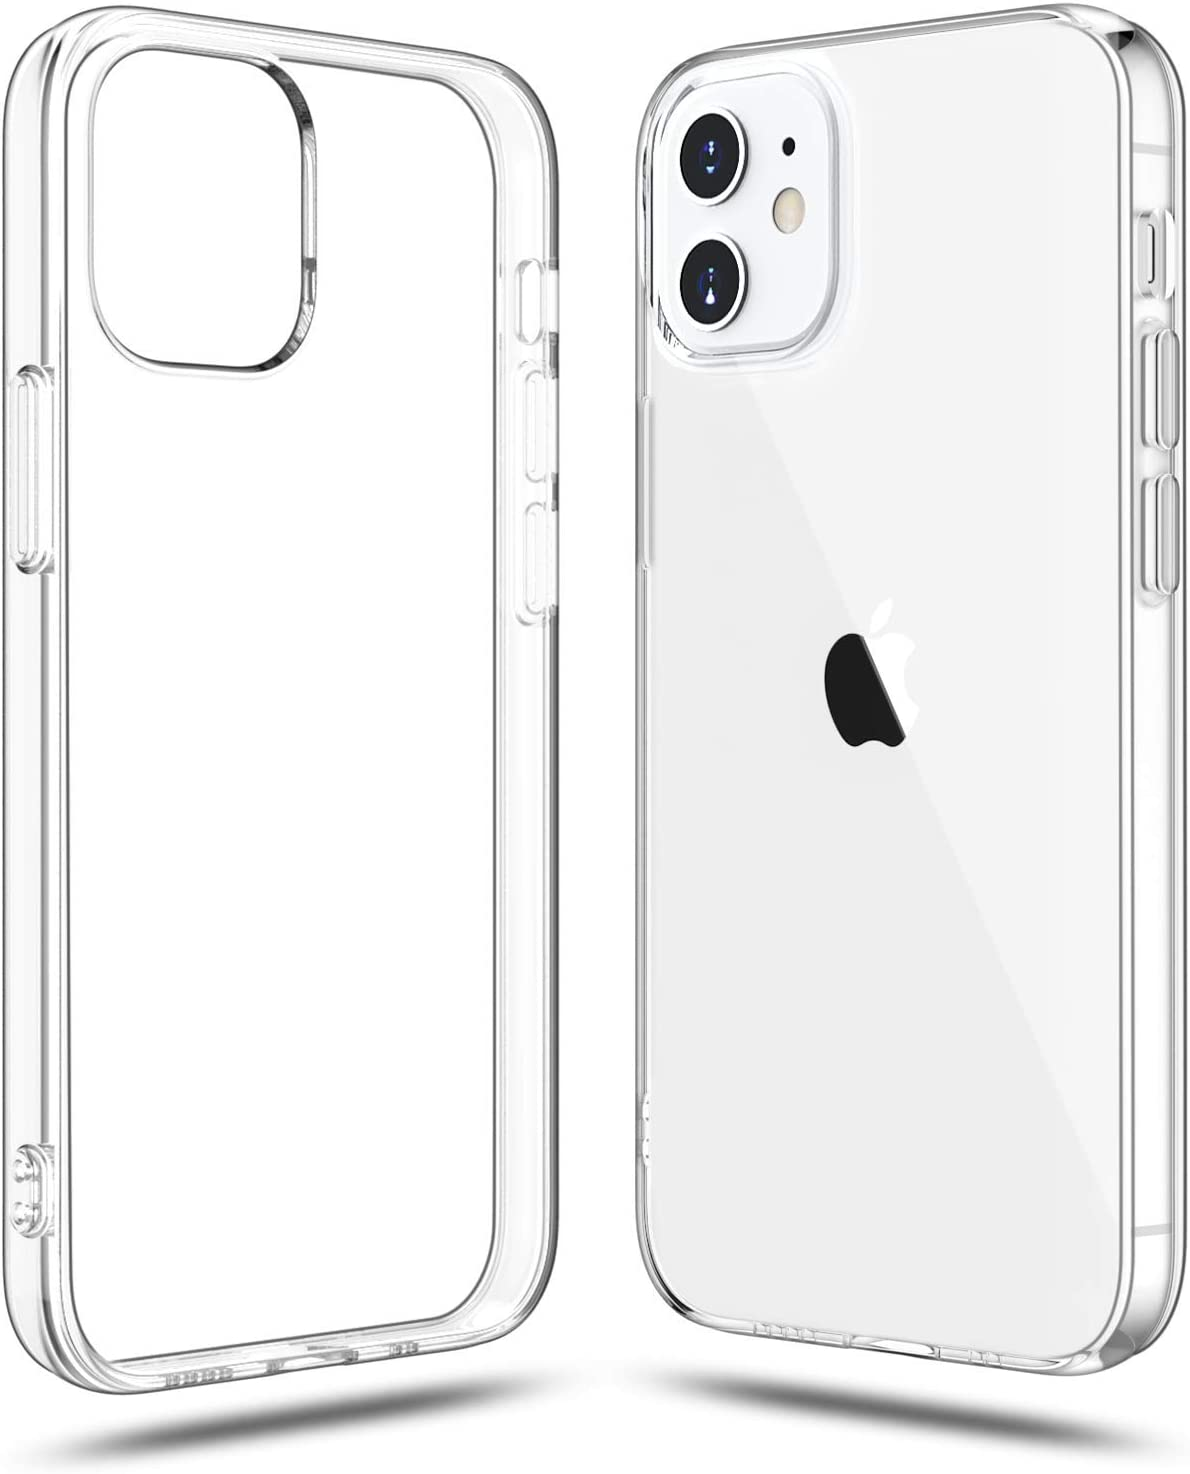 Shamo's Clear Case for iPhone 12 Mini Case Clear (2020), Shockproof Bumper Cover Soft TPU Silicone Transparent Anti-Scratch, HD Crystal Clear